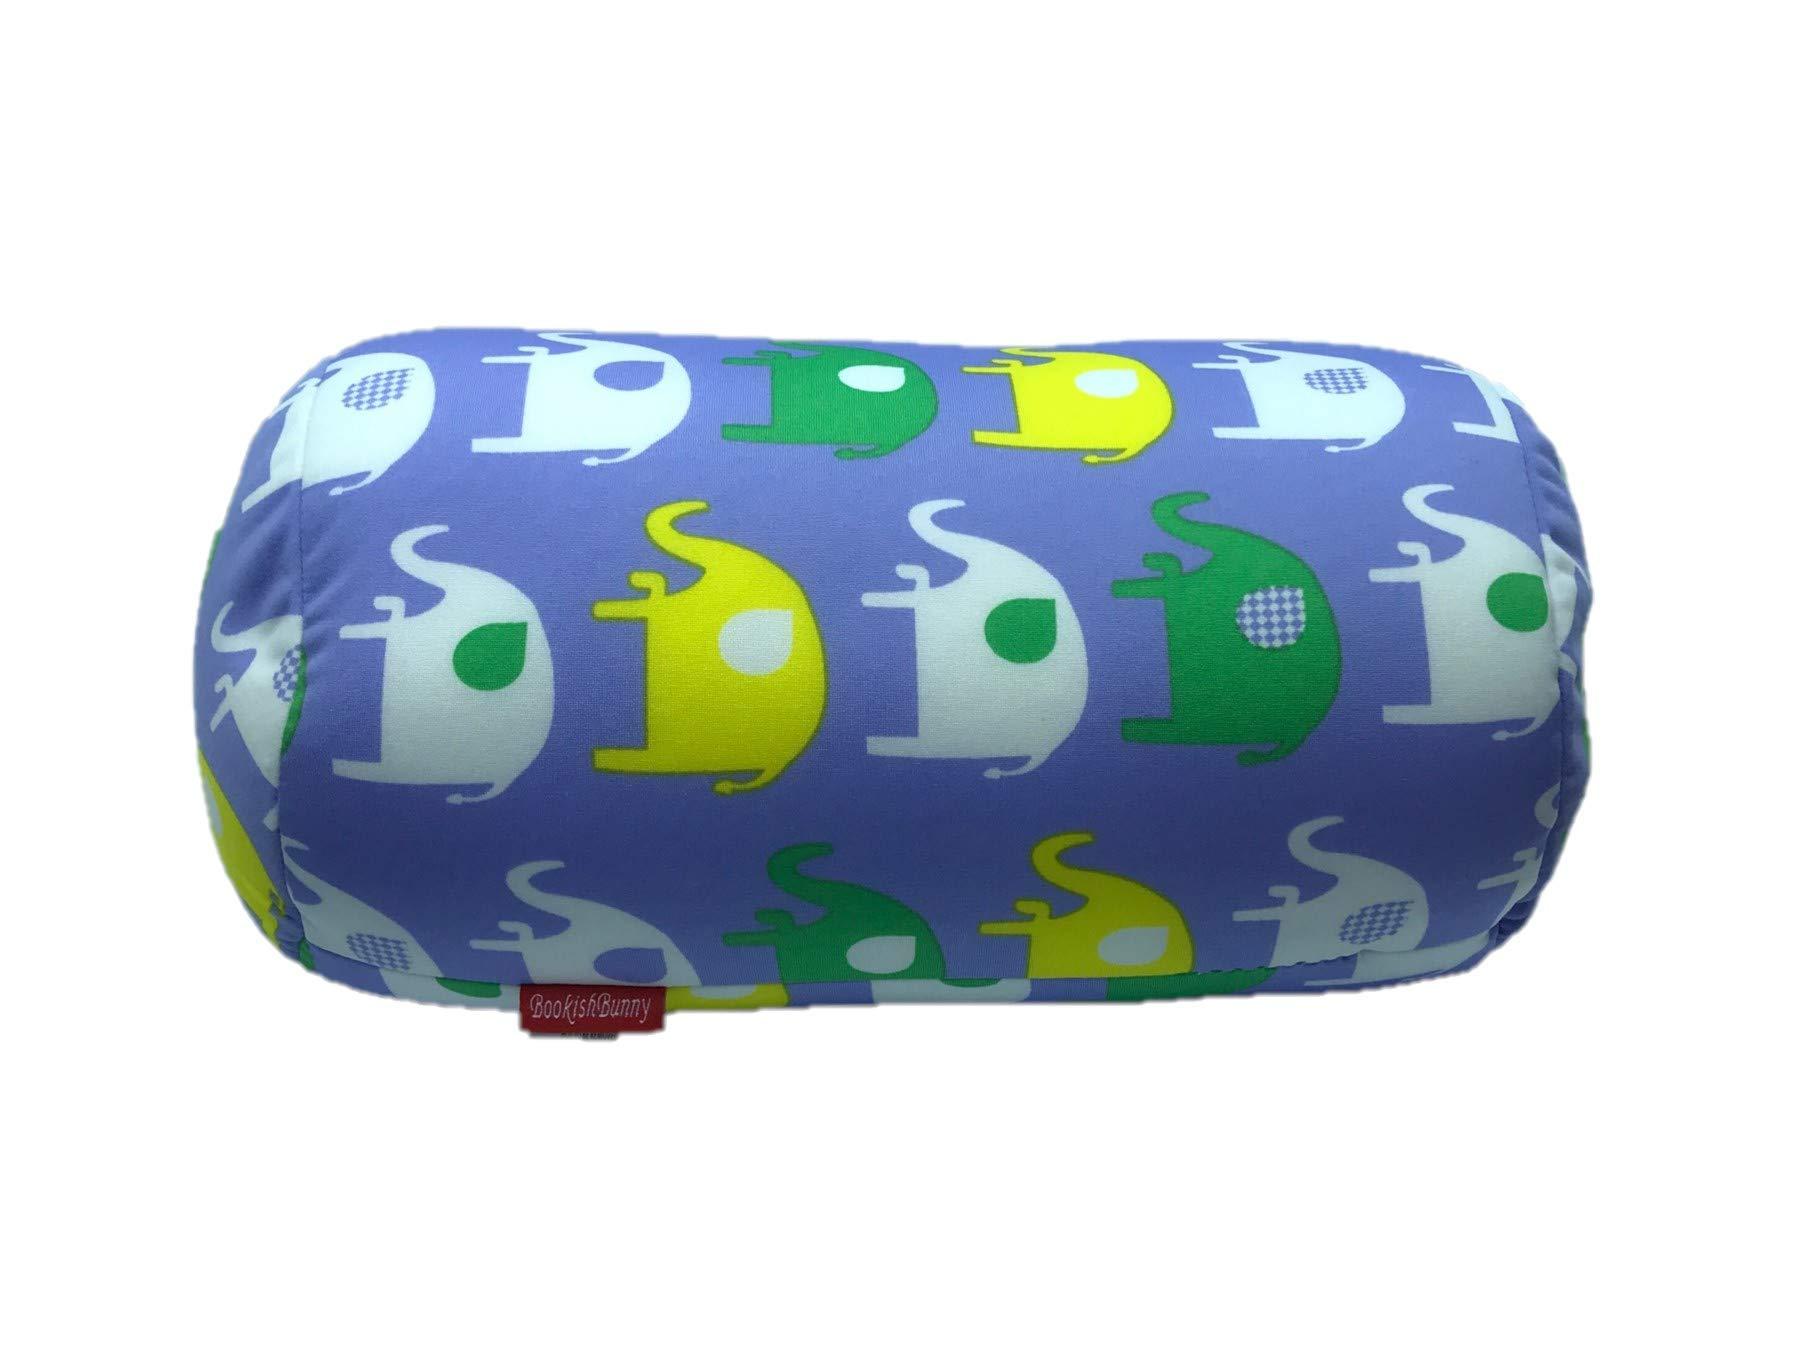 "Bookishbunny Home Office Chair Car Seat Cushion Micro Bead Roll Pillow 7"" x 12"" Head Neck Back Body Comfort (Elephant)"